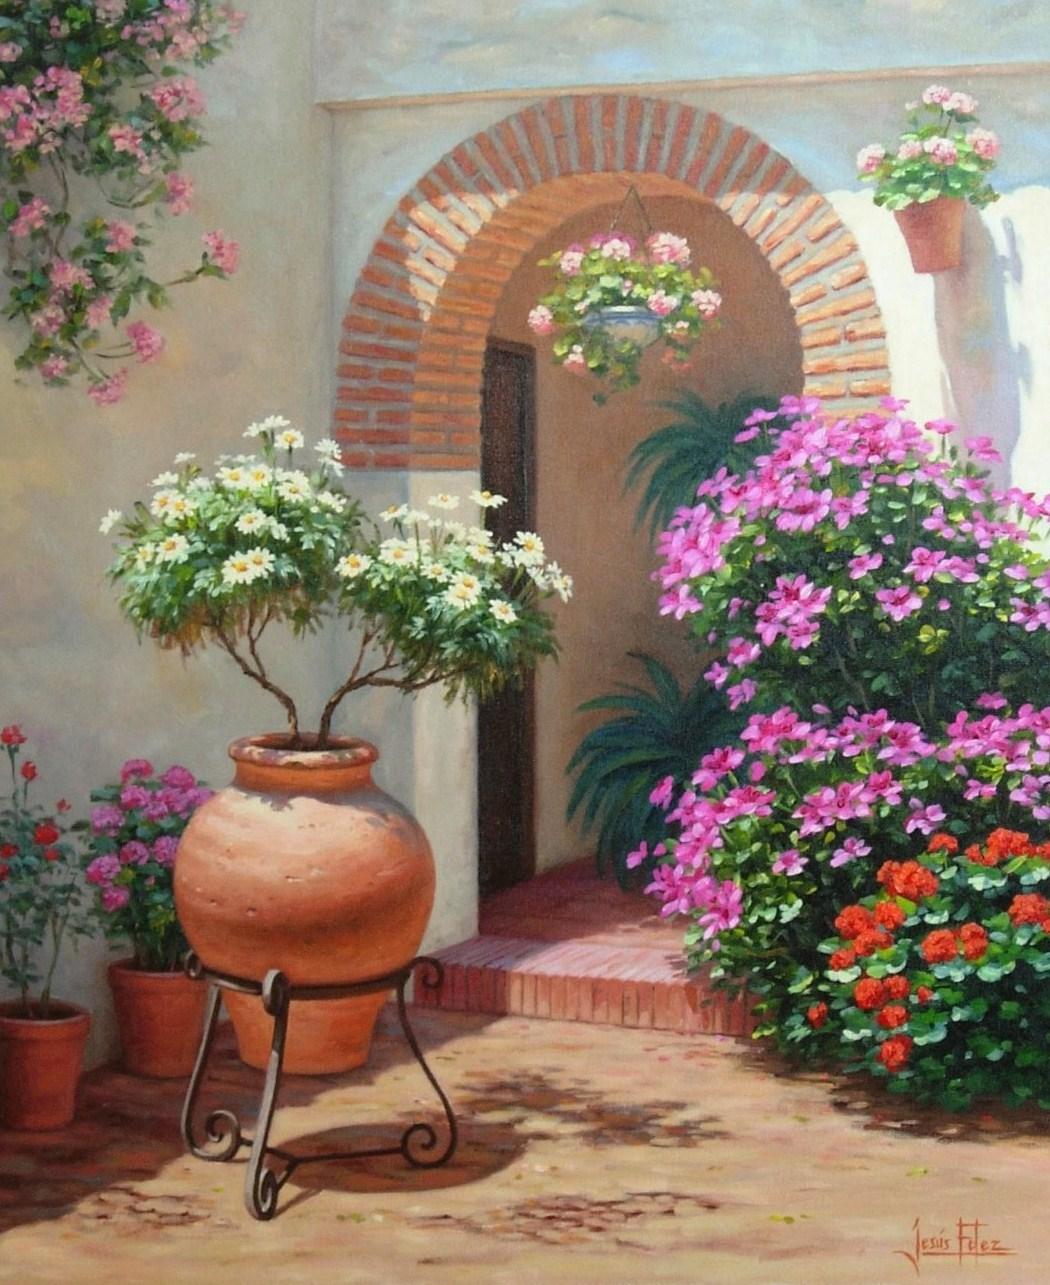 óleo sobre lienzo cuadros de paisajes pinturas de paisajes al óleo